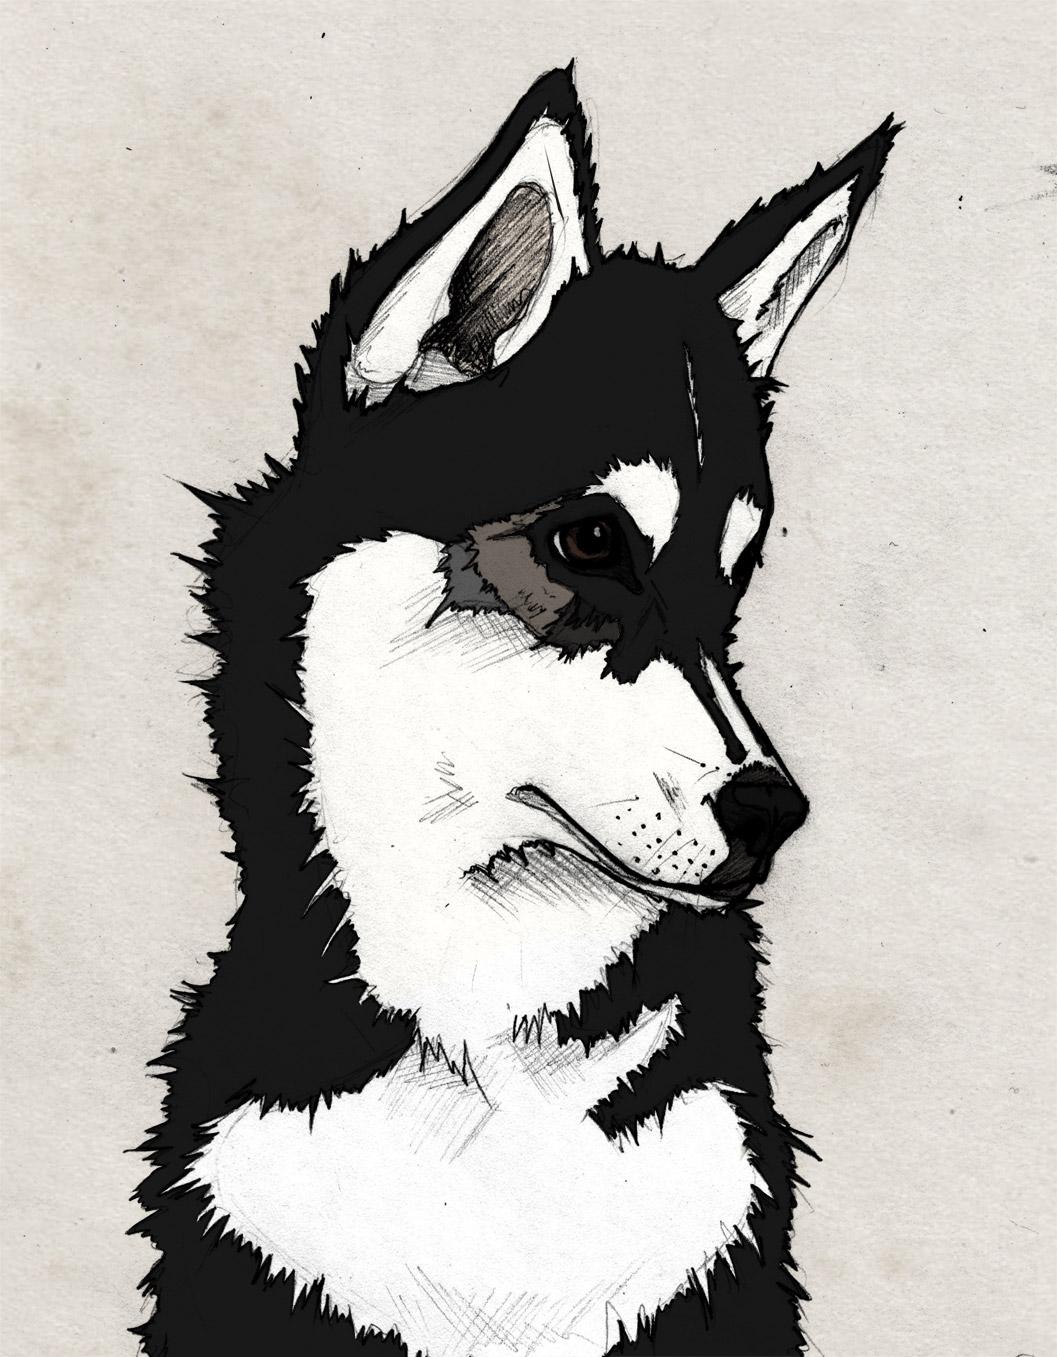 Nico, Sketch, Illustration, Husky, Siberian Husky, Puppy, Black, Graphic, Photoshop